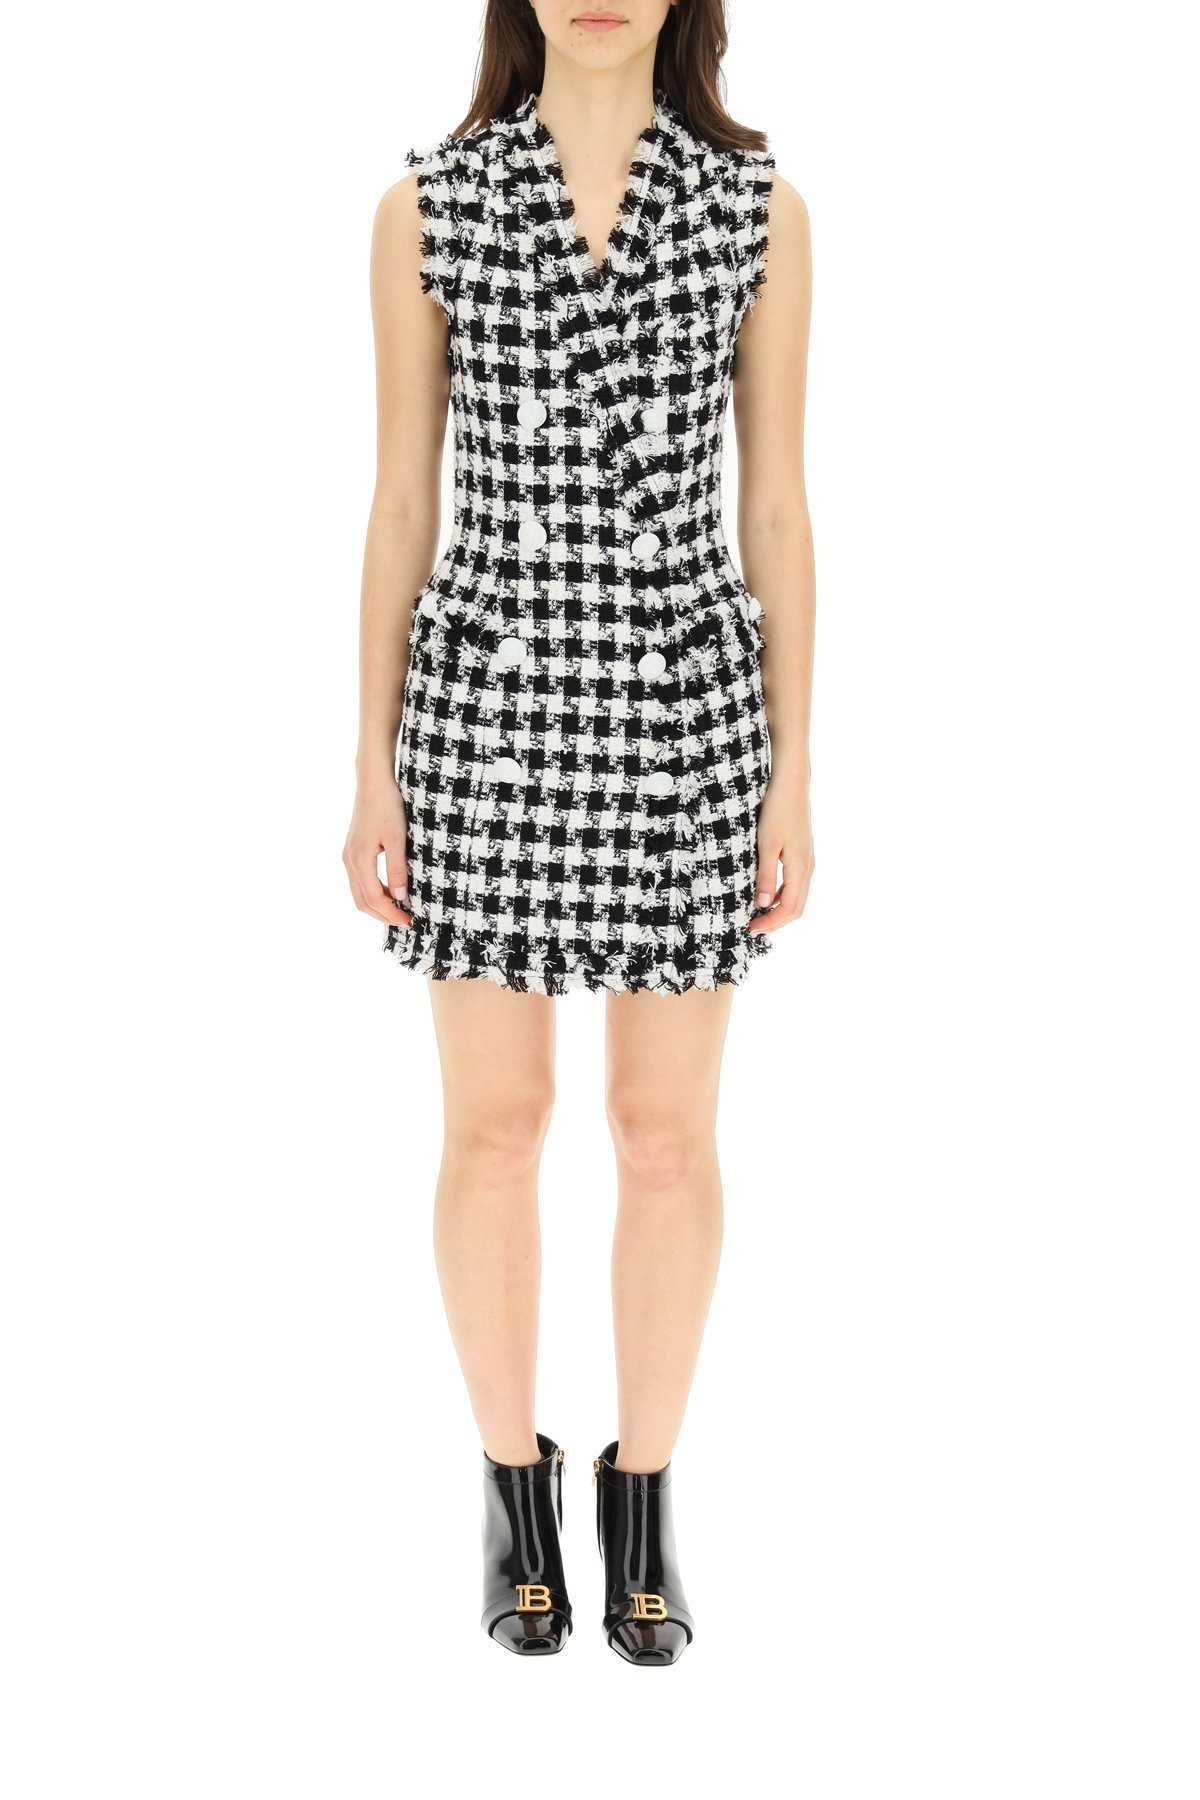 Balmain mini dress gingham